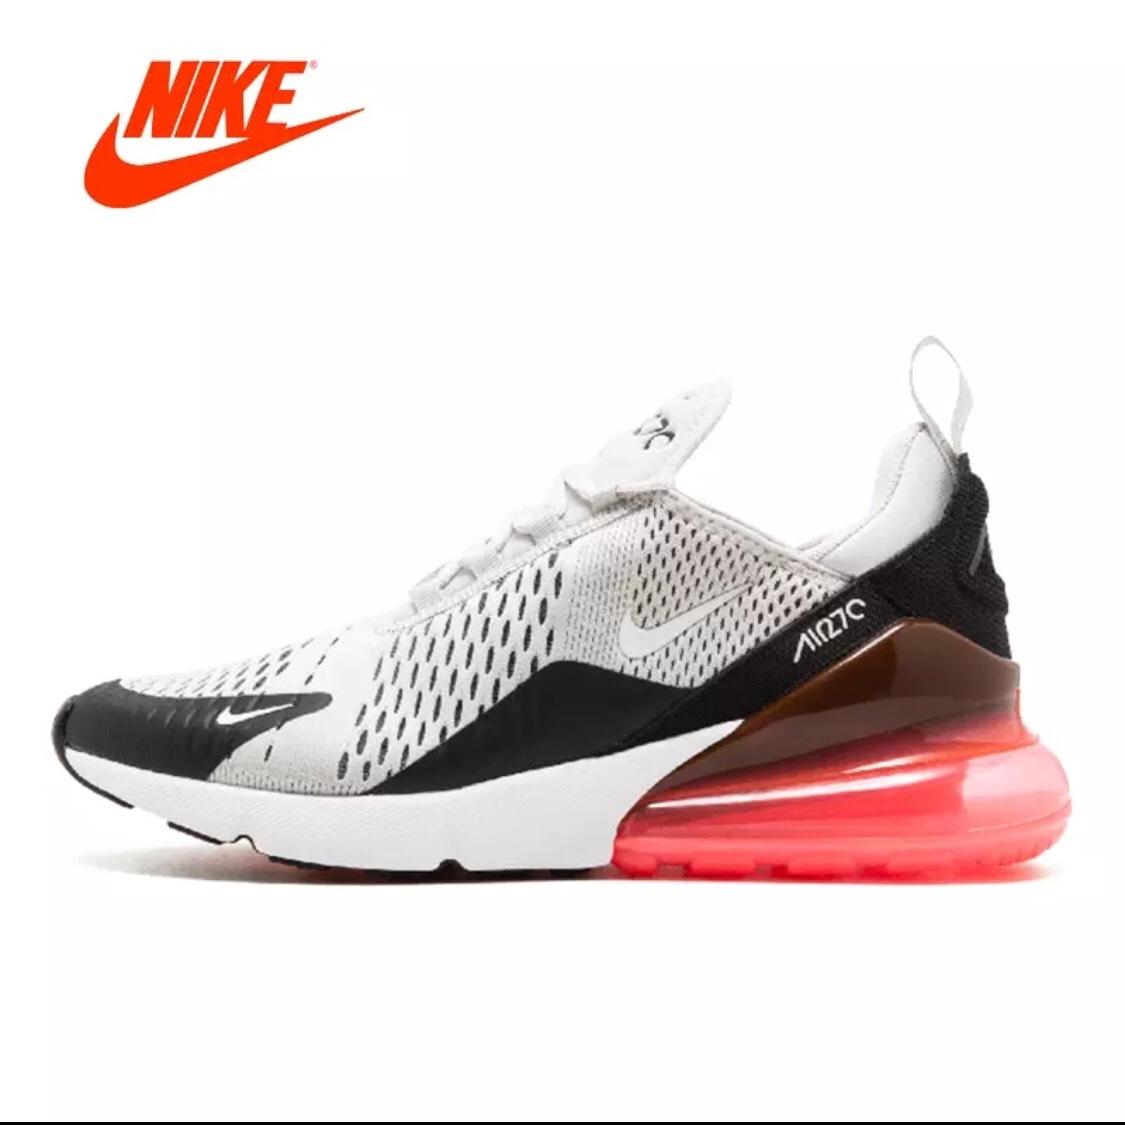 Nike Air Max 270 oferta relámpago!!!